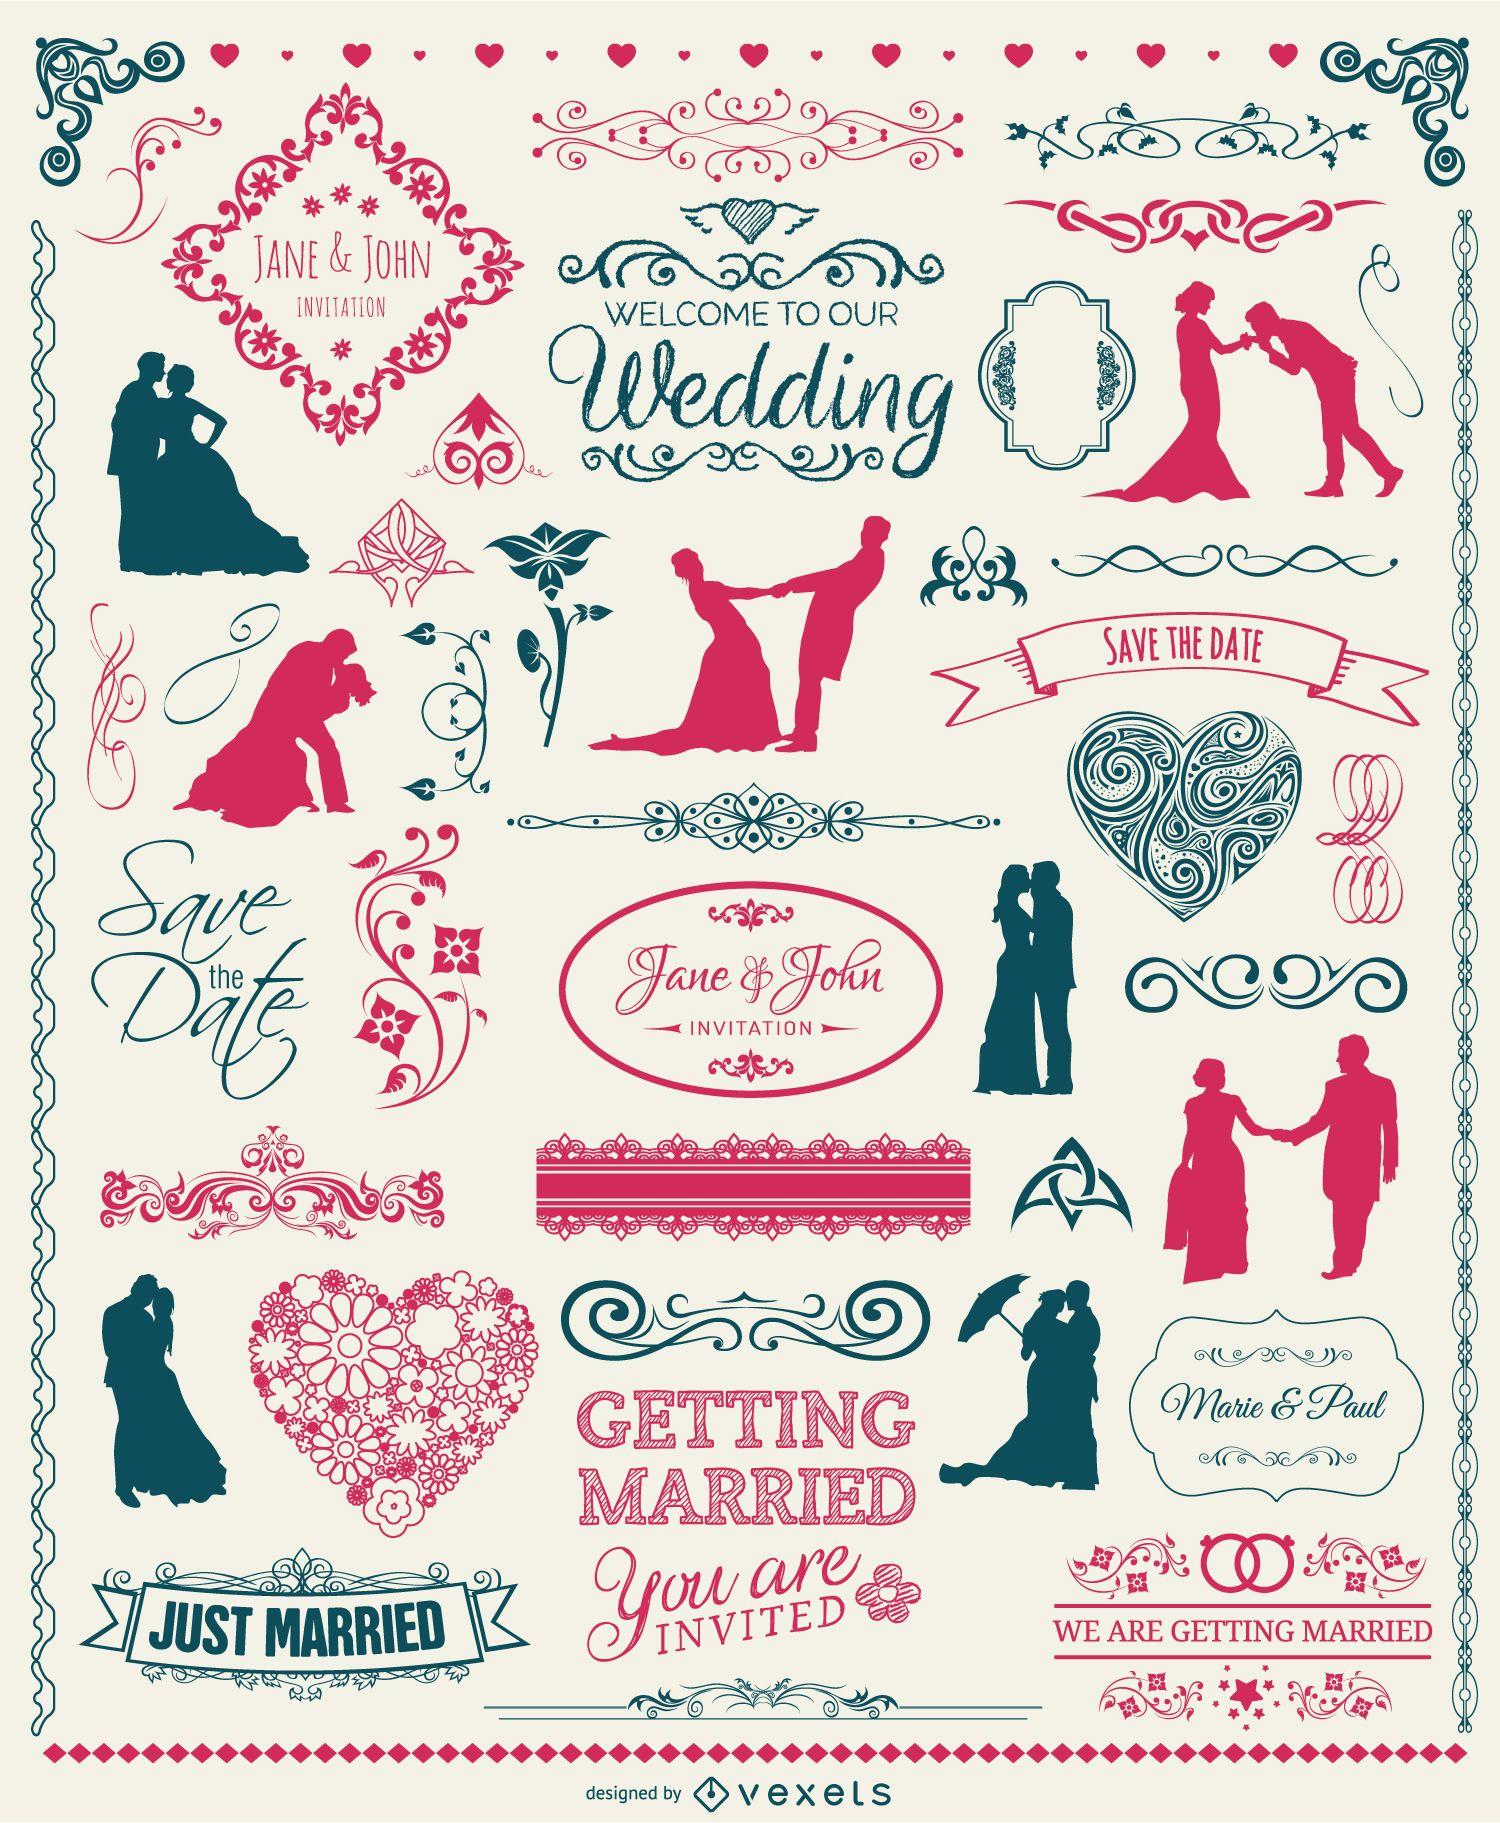 Wedding Elements Set - badges silhouettes emblems and ornaments